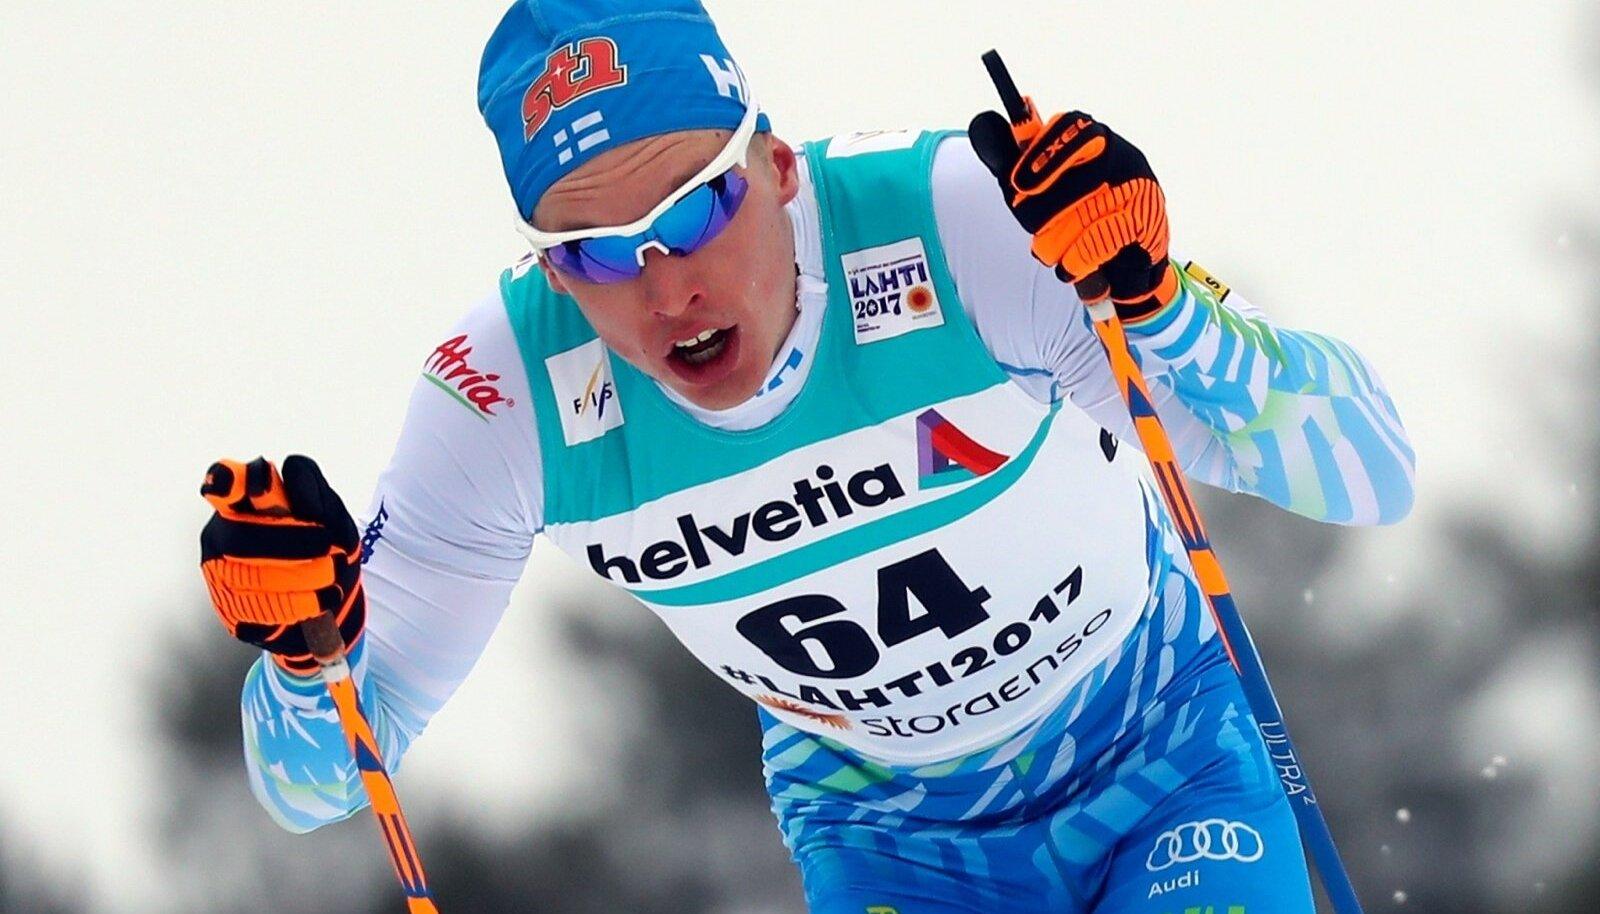 FIS Nordic Ski World Championships - Men's Cross-Country 15 km Classical